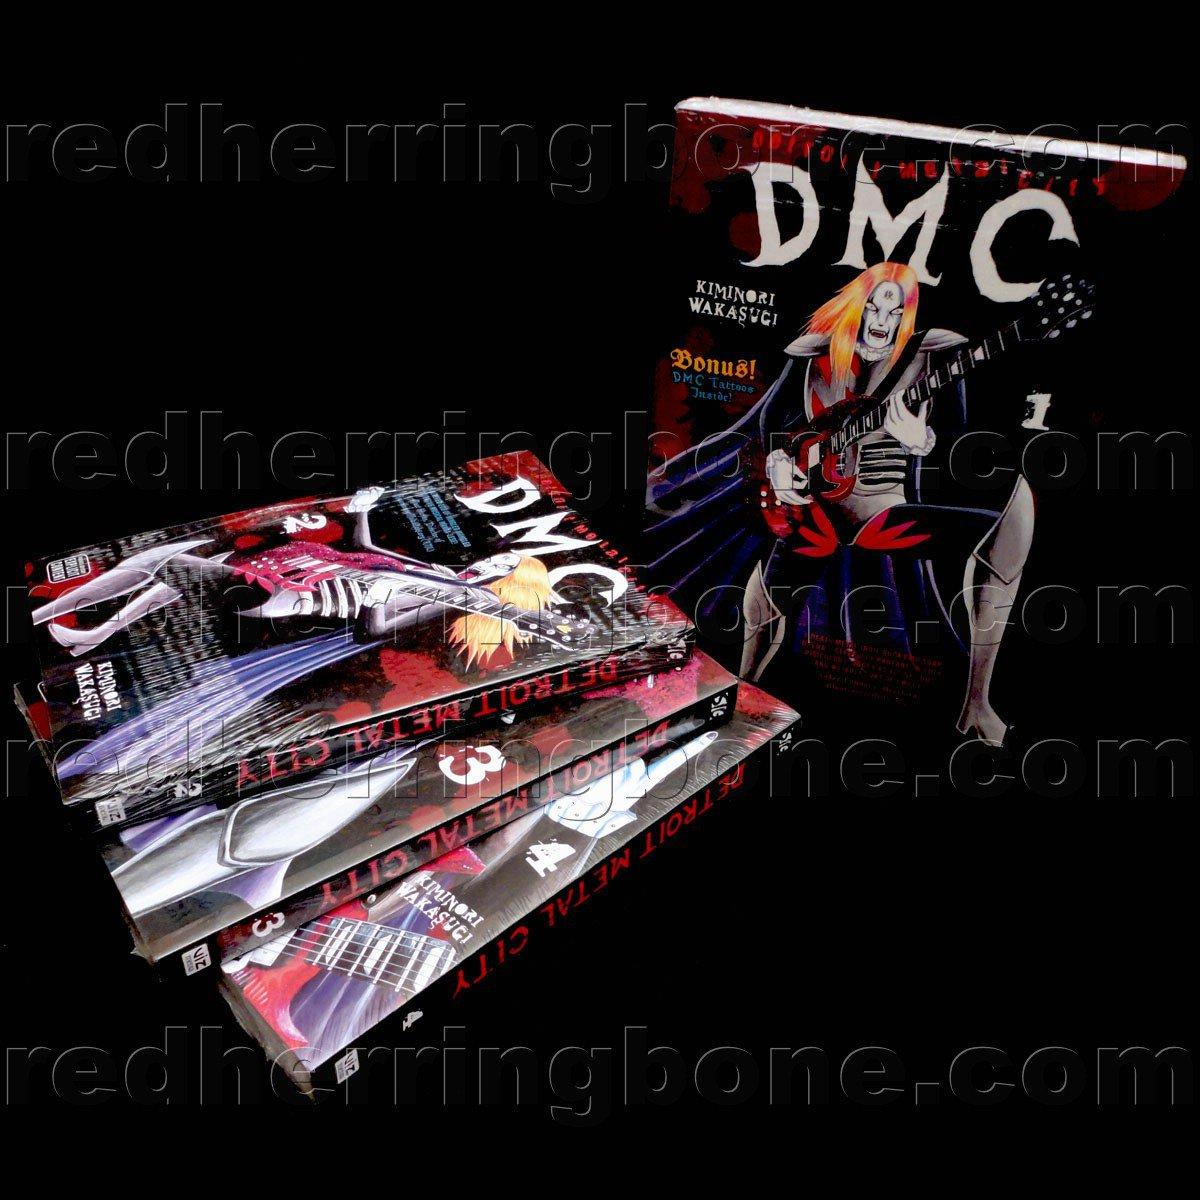 Detroit Metal City, Vol. 1-4 Manga (set includes 4 volumes) Kiminori Wakasugi NEW